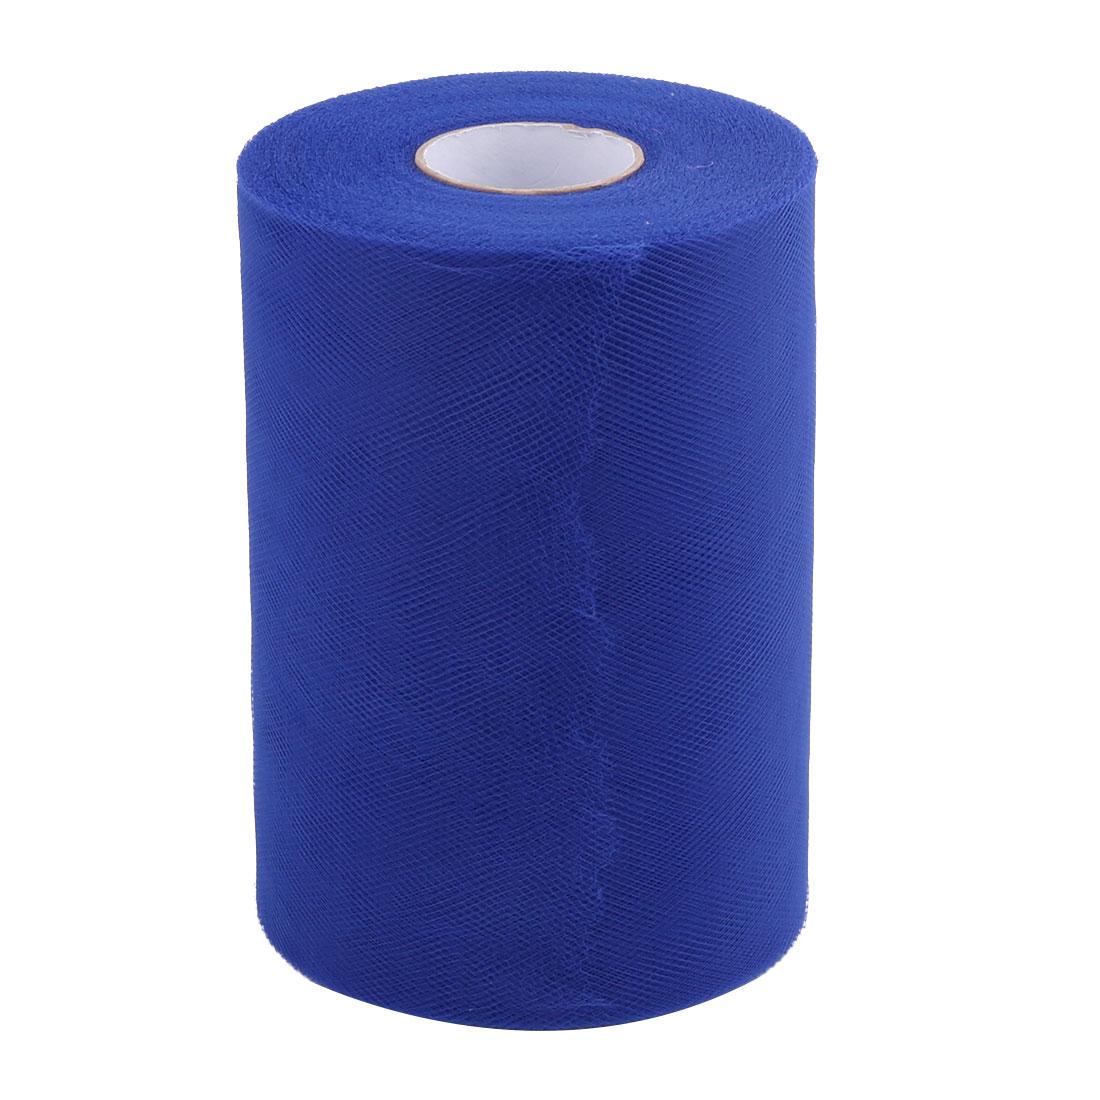 Shop Dress Tutu Gift Decor Tulle Spool Roll Royal Blue 6 Inch x 100 Yards